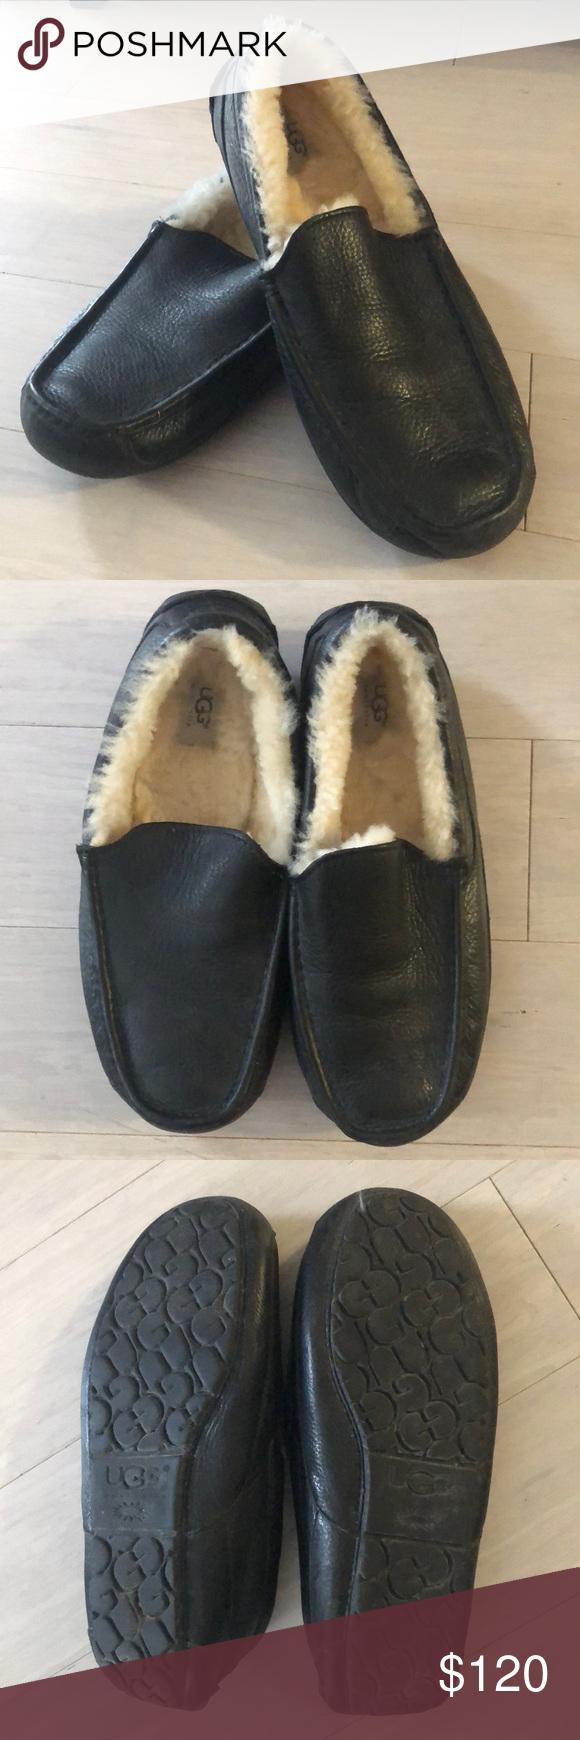 aa1e592e362 Men s UGG Slippers (Ascot Slipper) Brand New - was gift has been sitting  around